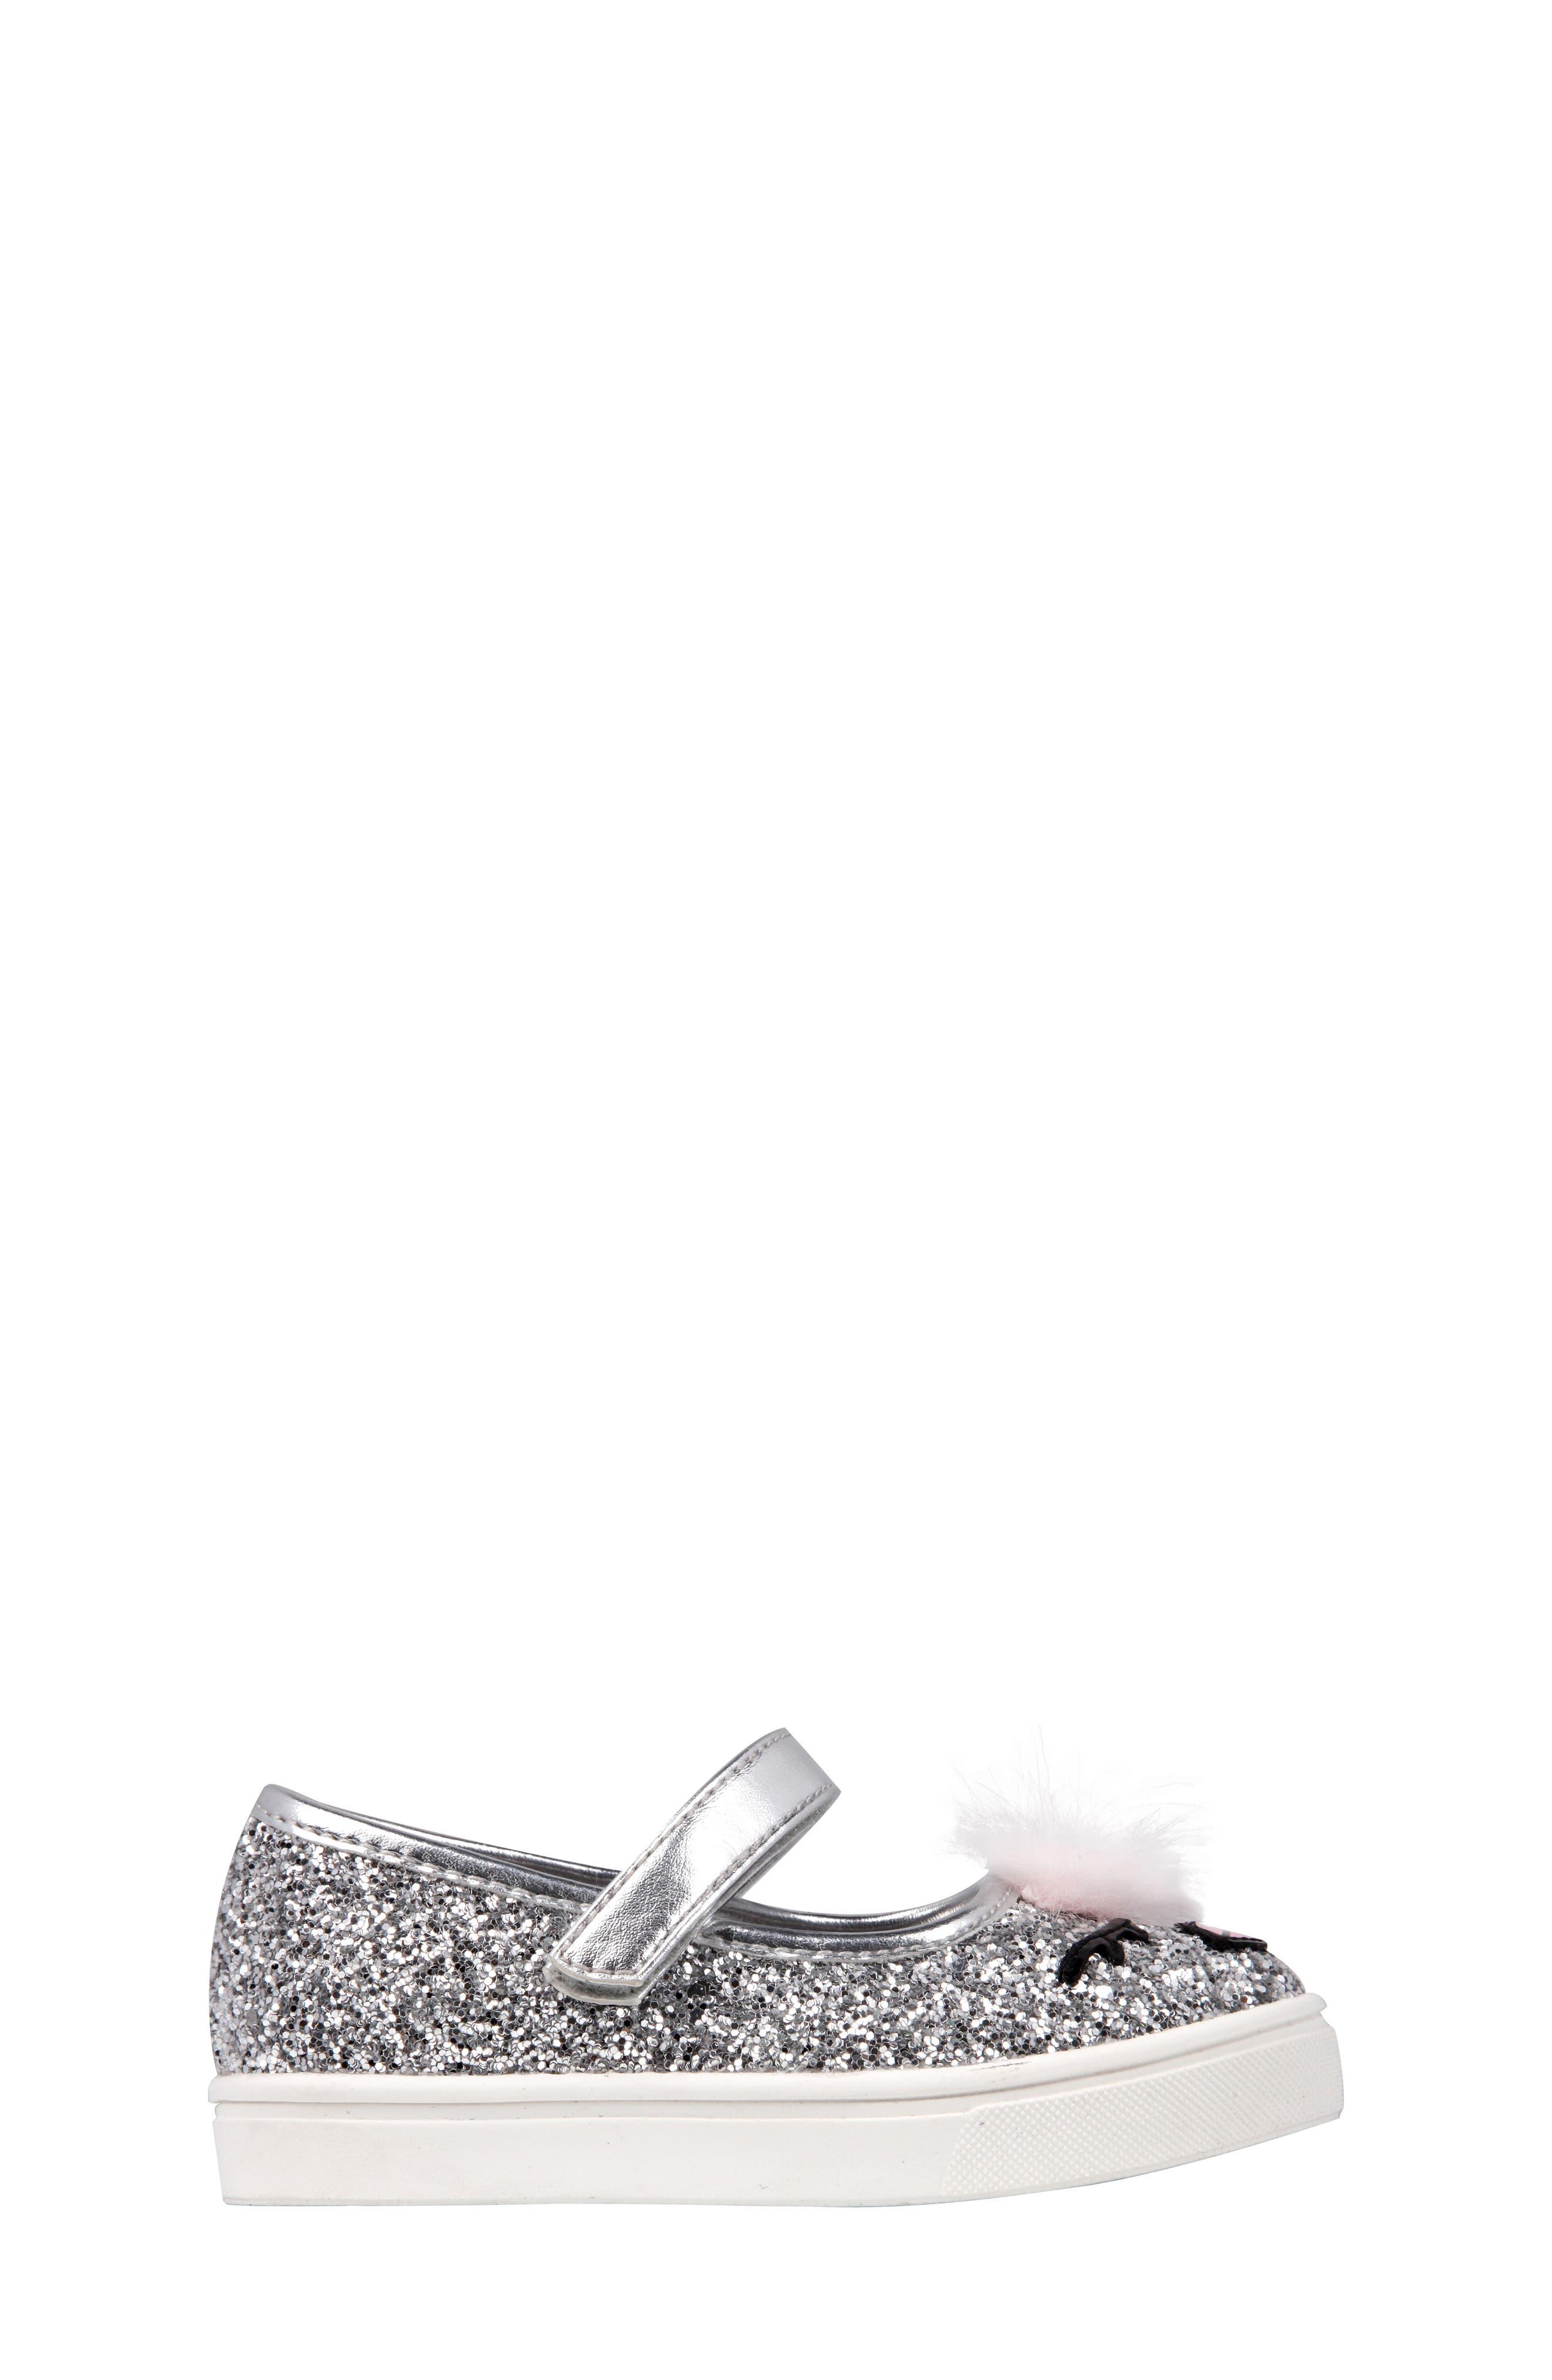 Ragina Faux Fur Glitter Mary Jane Sneaker,                             Alternate thumbnail 3, color,                             Silver Chunky Glitter